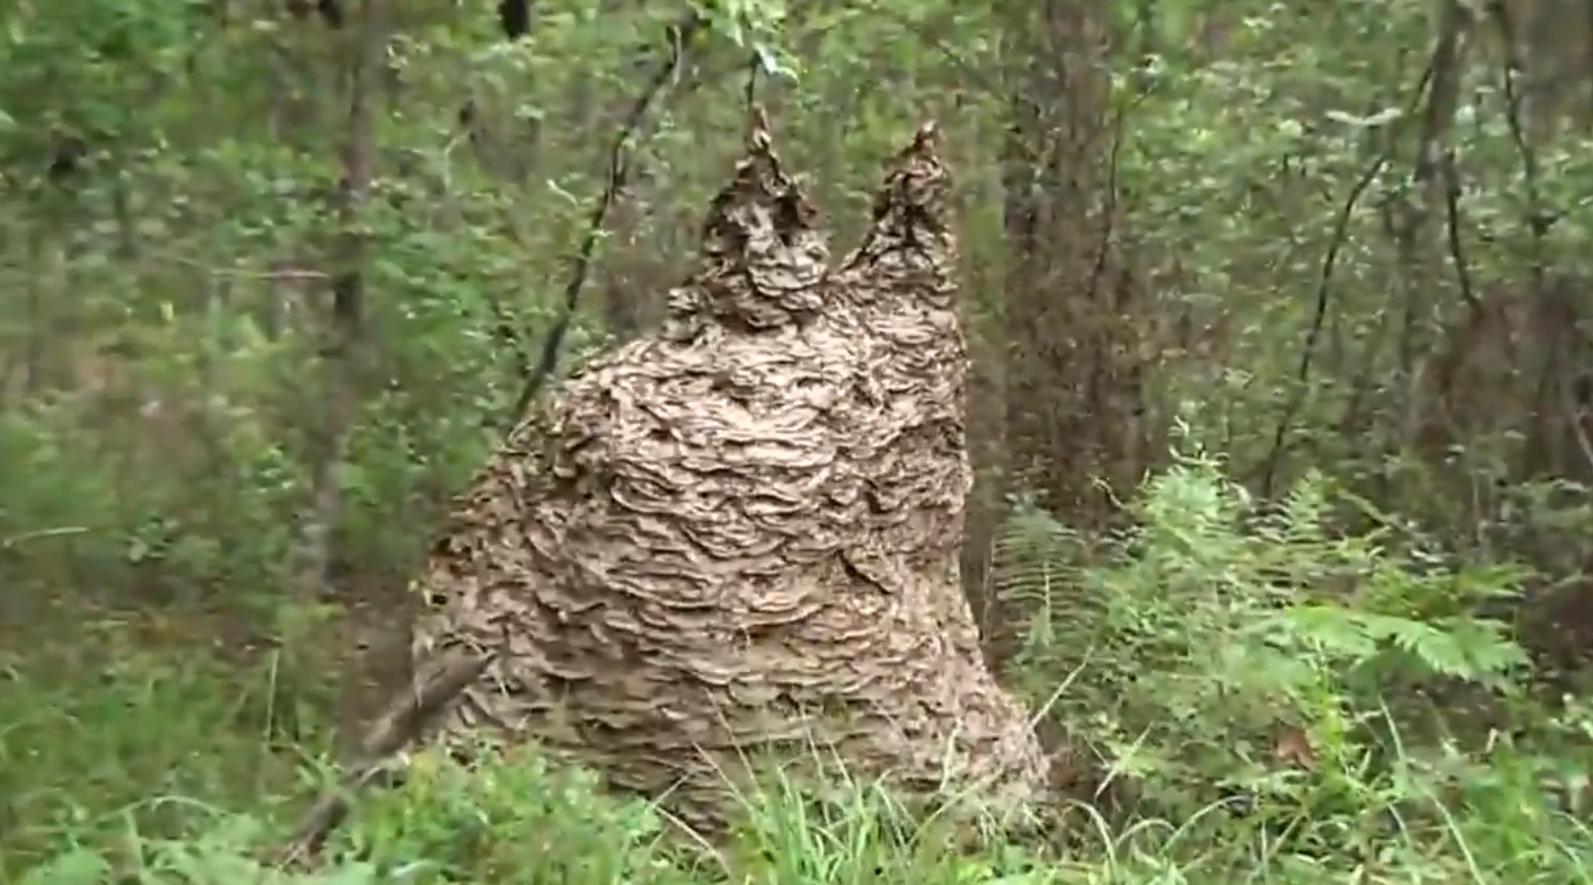 Video: Riling a Giant Yellow Jacket Nest | OutdoorHub